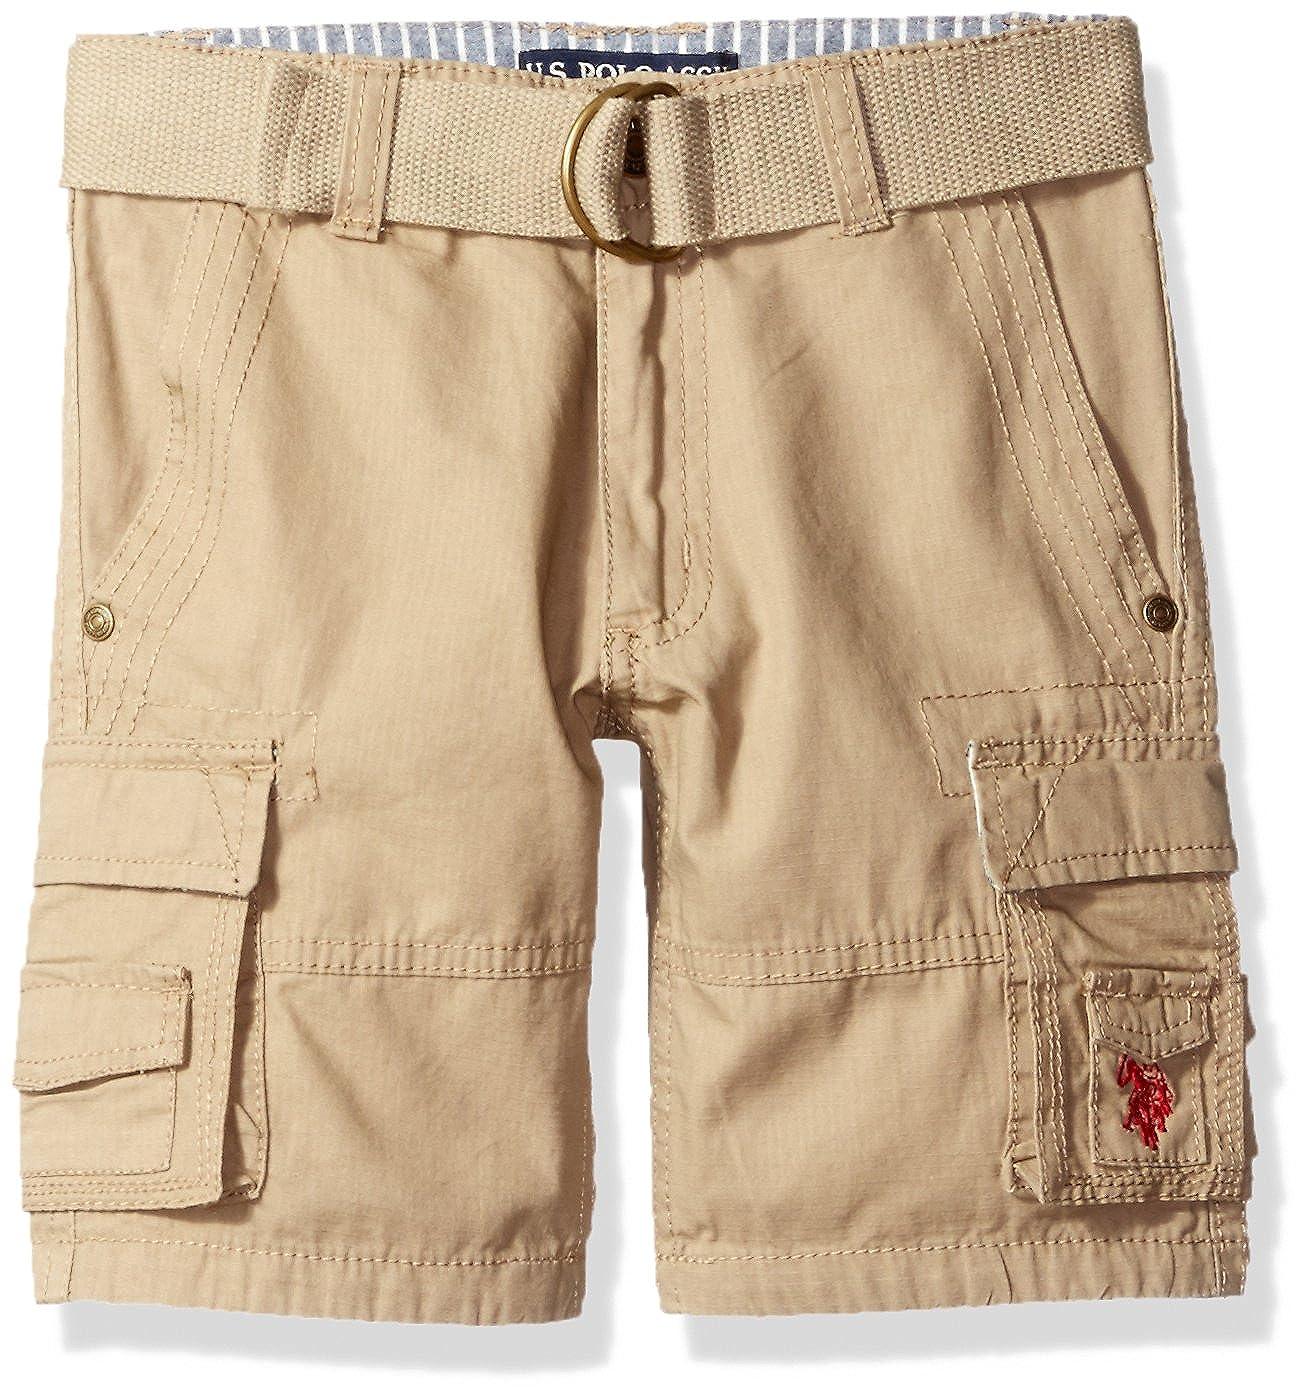 U.S. Polo Assn Kinder Jungen Shorts kurze Hose Cargo mit Gürtel beige 110 - 116 S5HH41DDV-5